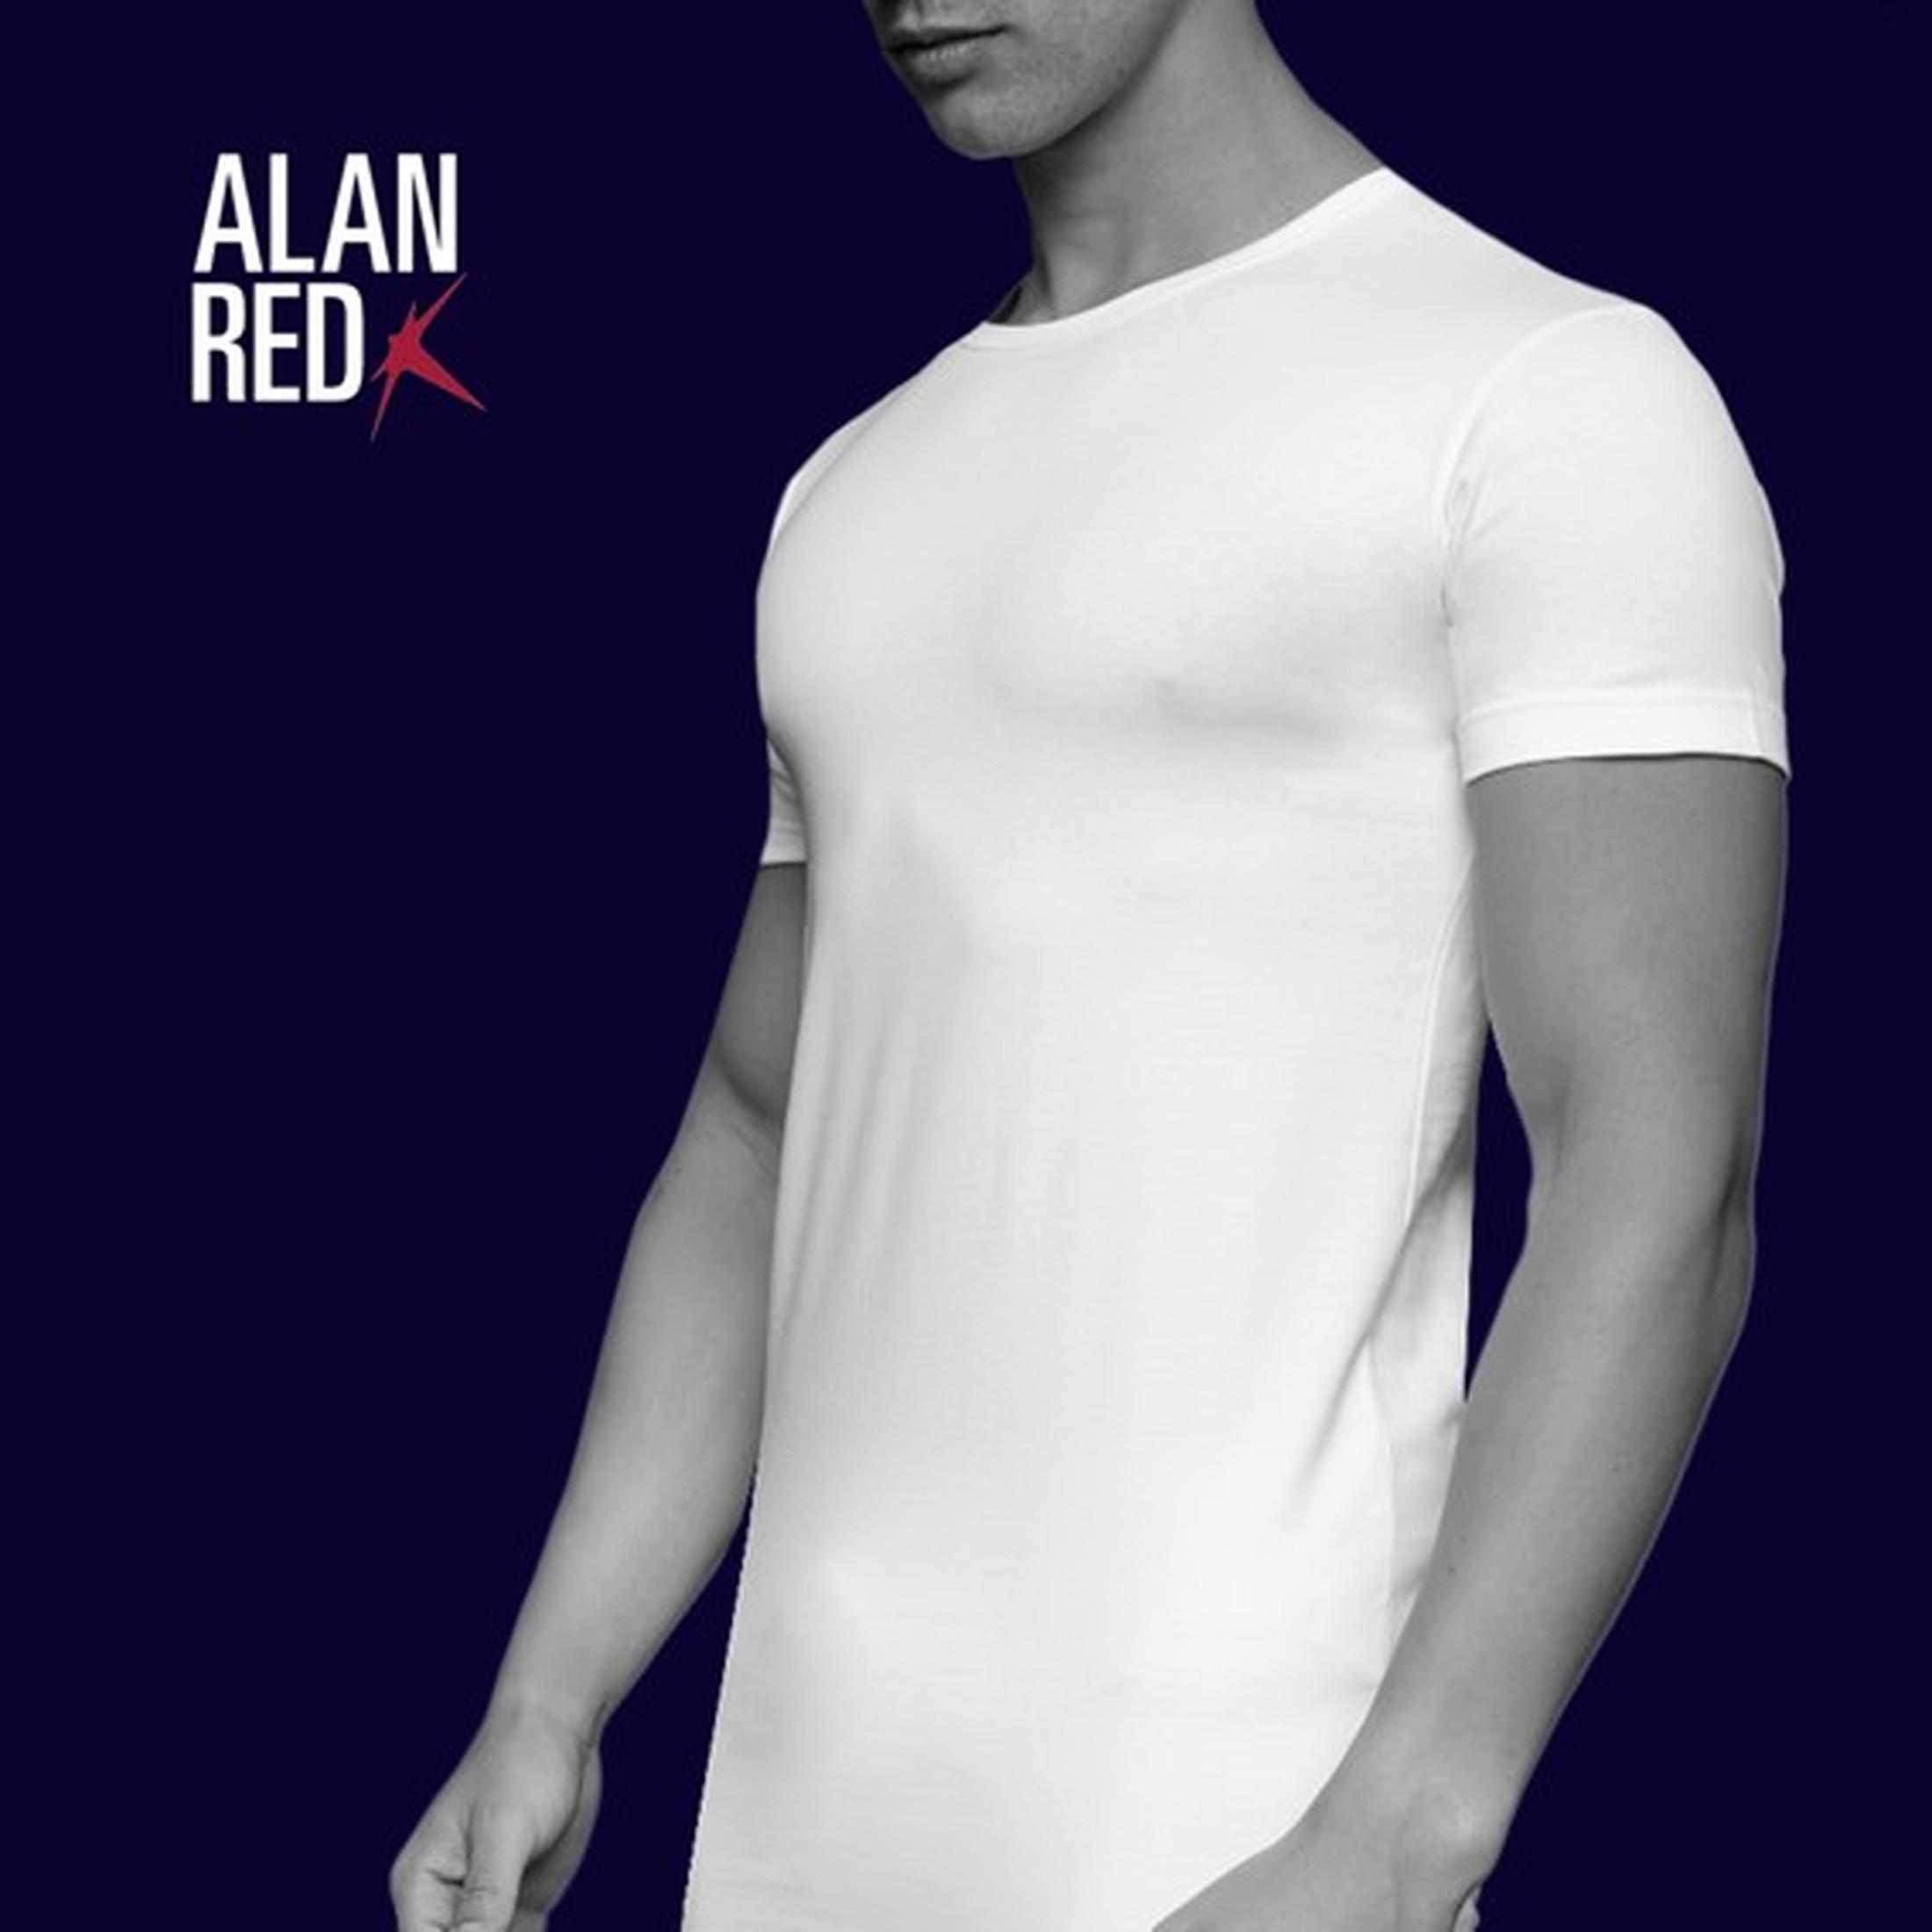 Alan Red Ottawa T-shirt Stretch White 2-Pack photo 5